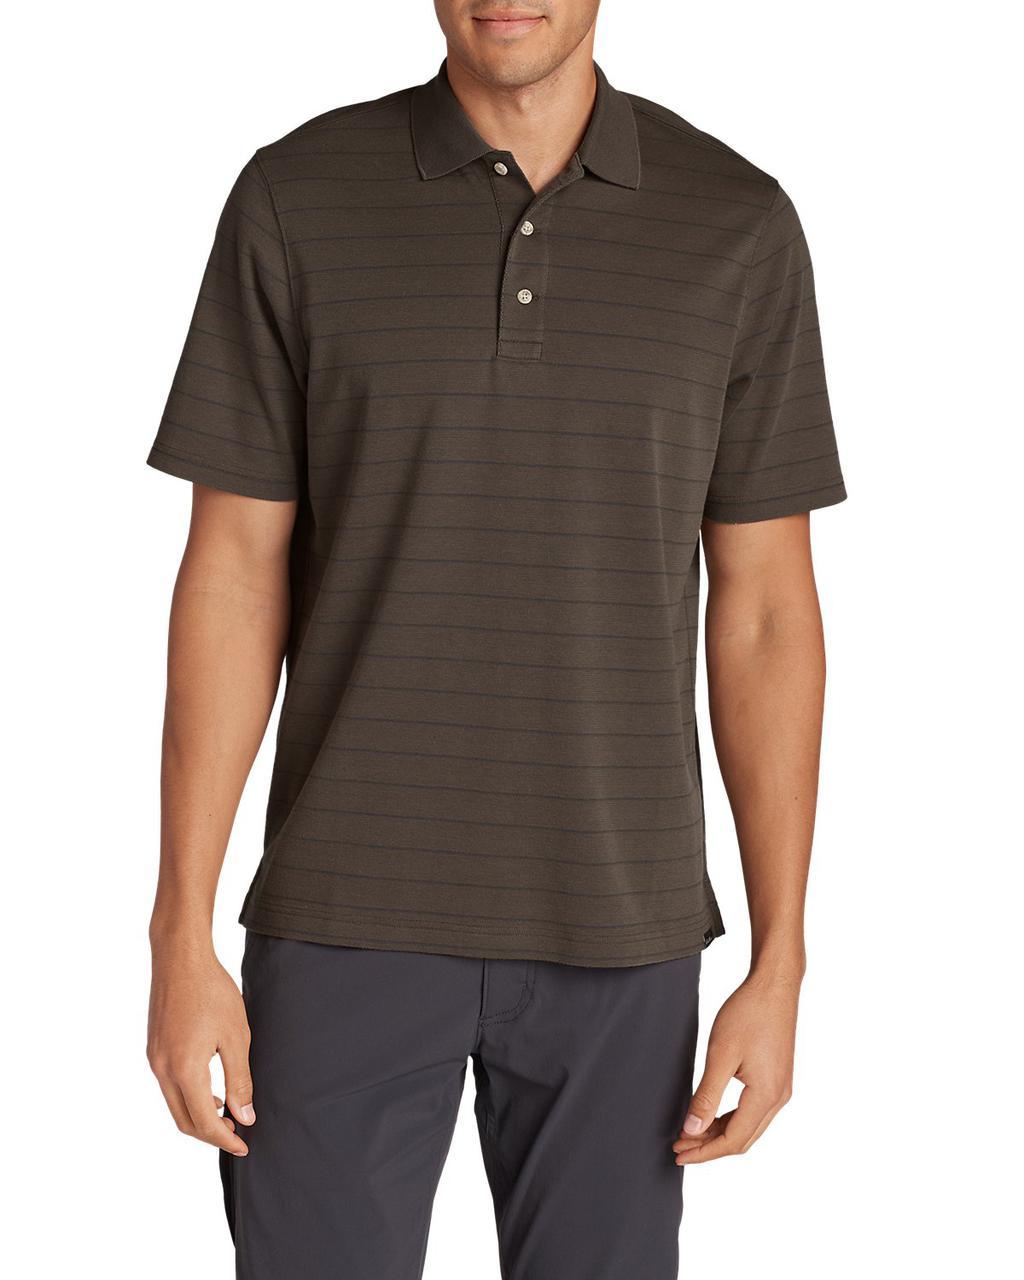 Поло Eddie Bauer Voyager II Performance Short-Sleeve Polo Shirt M